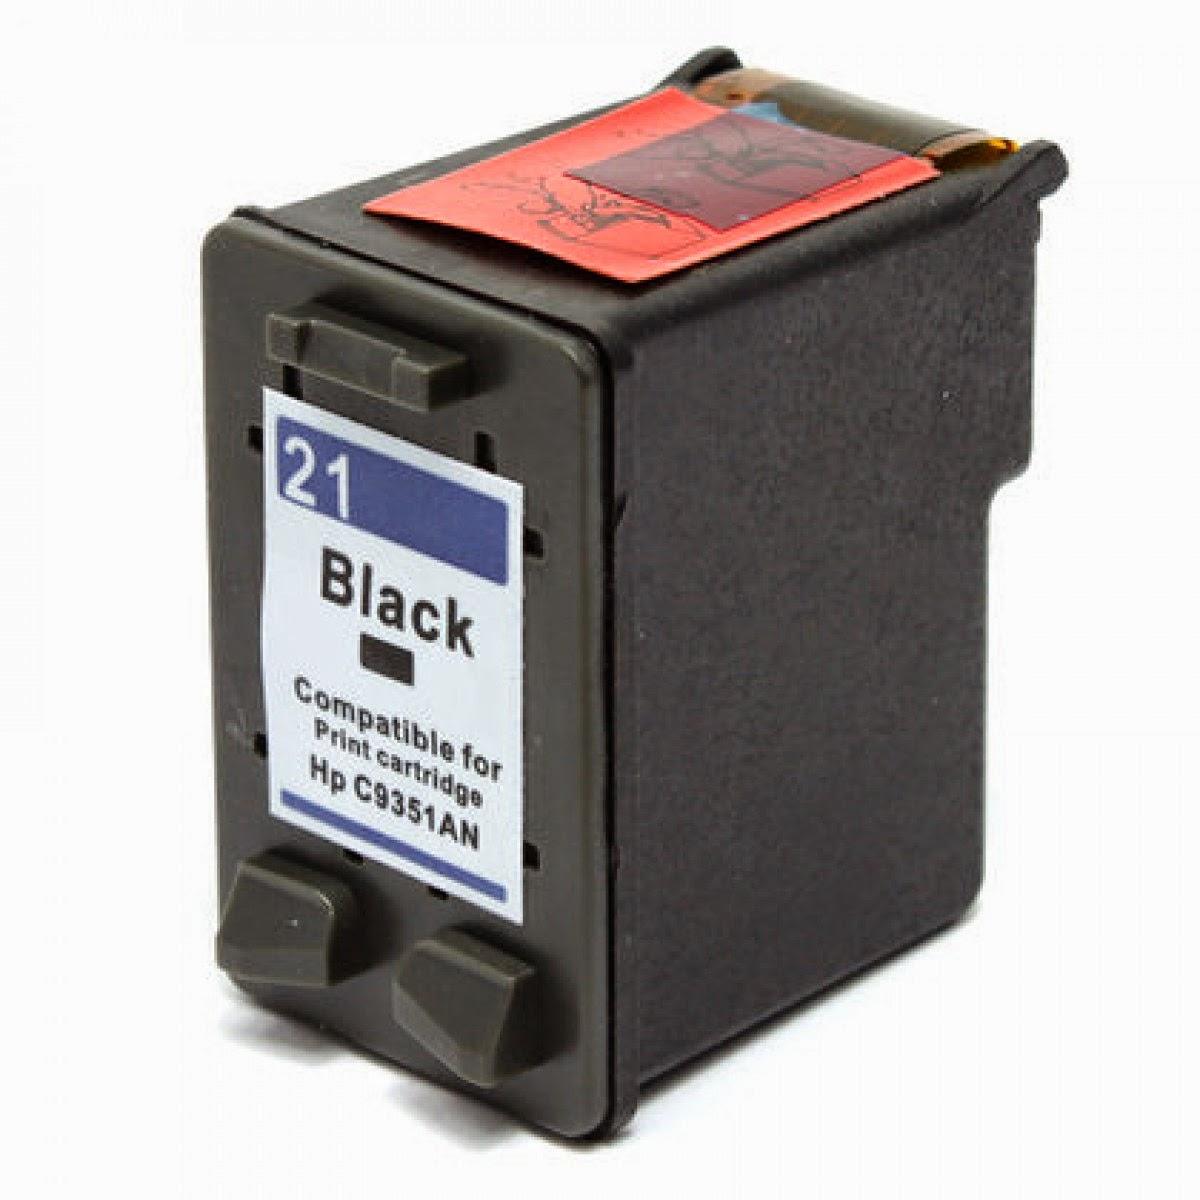 Hp 61 Black Ink Cartridge Compatibility Tinta 46 Colour Original Team Uk Offering High Quality Printer Cartridges